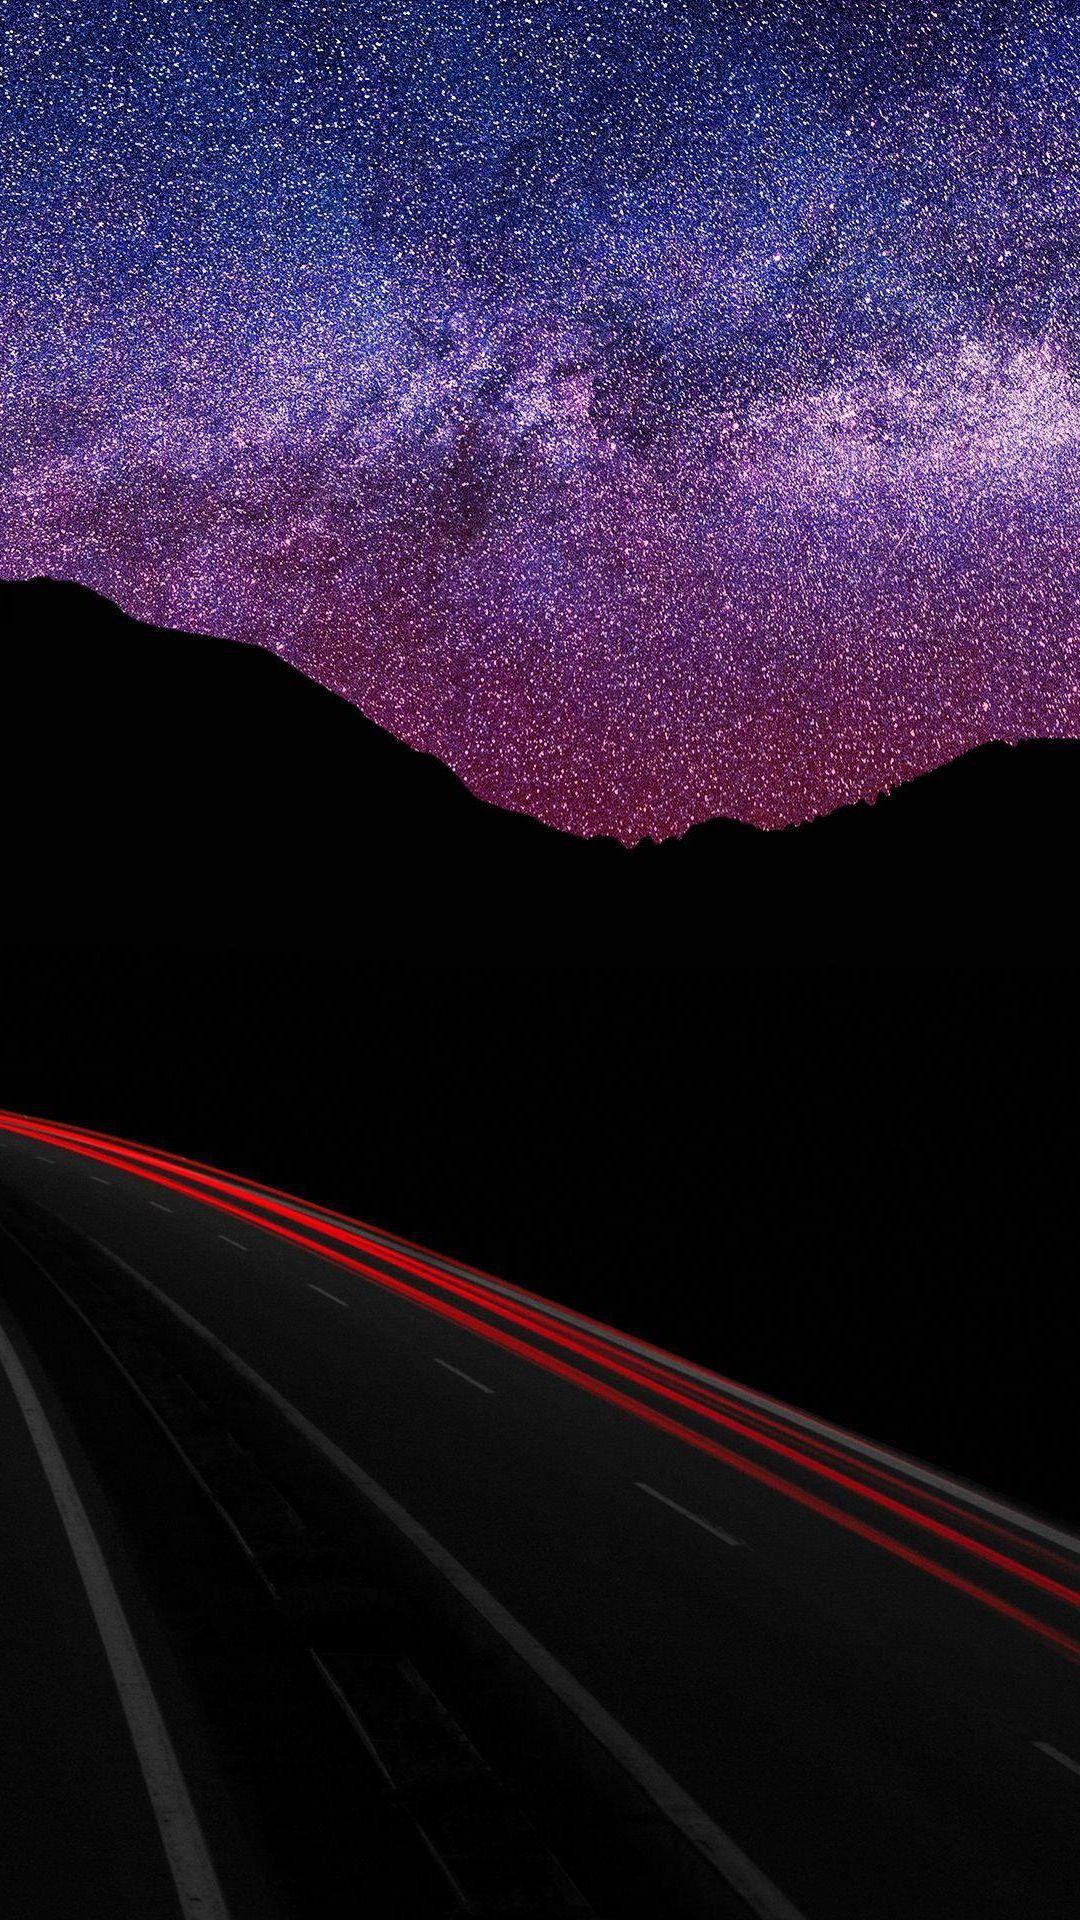 Wallpaper Pemandangan Malam Hd Dengan Gambar